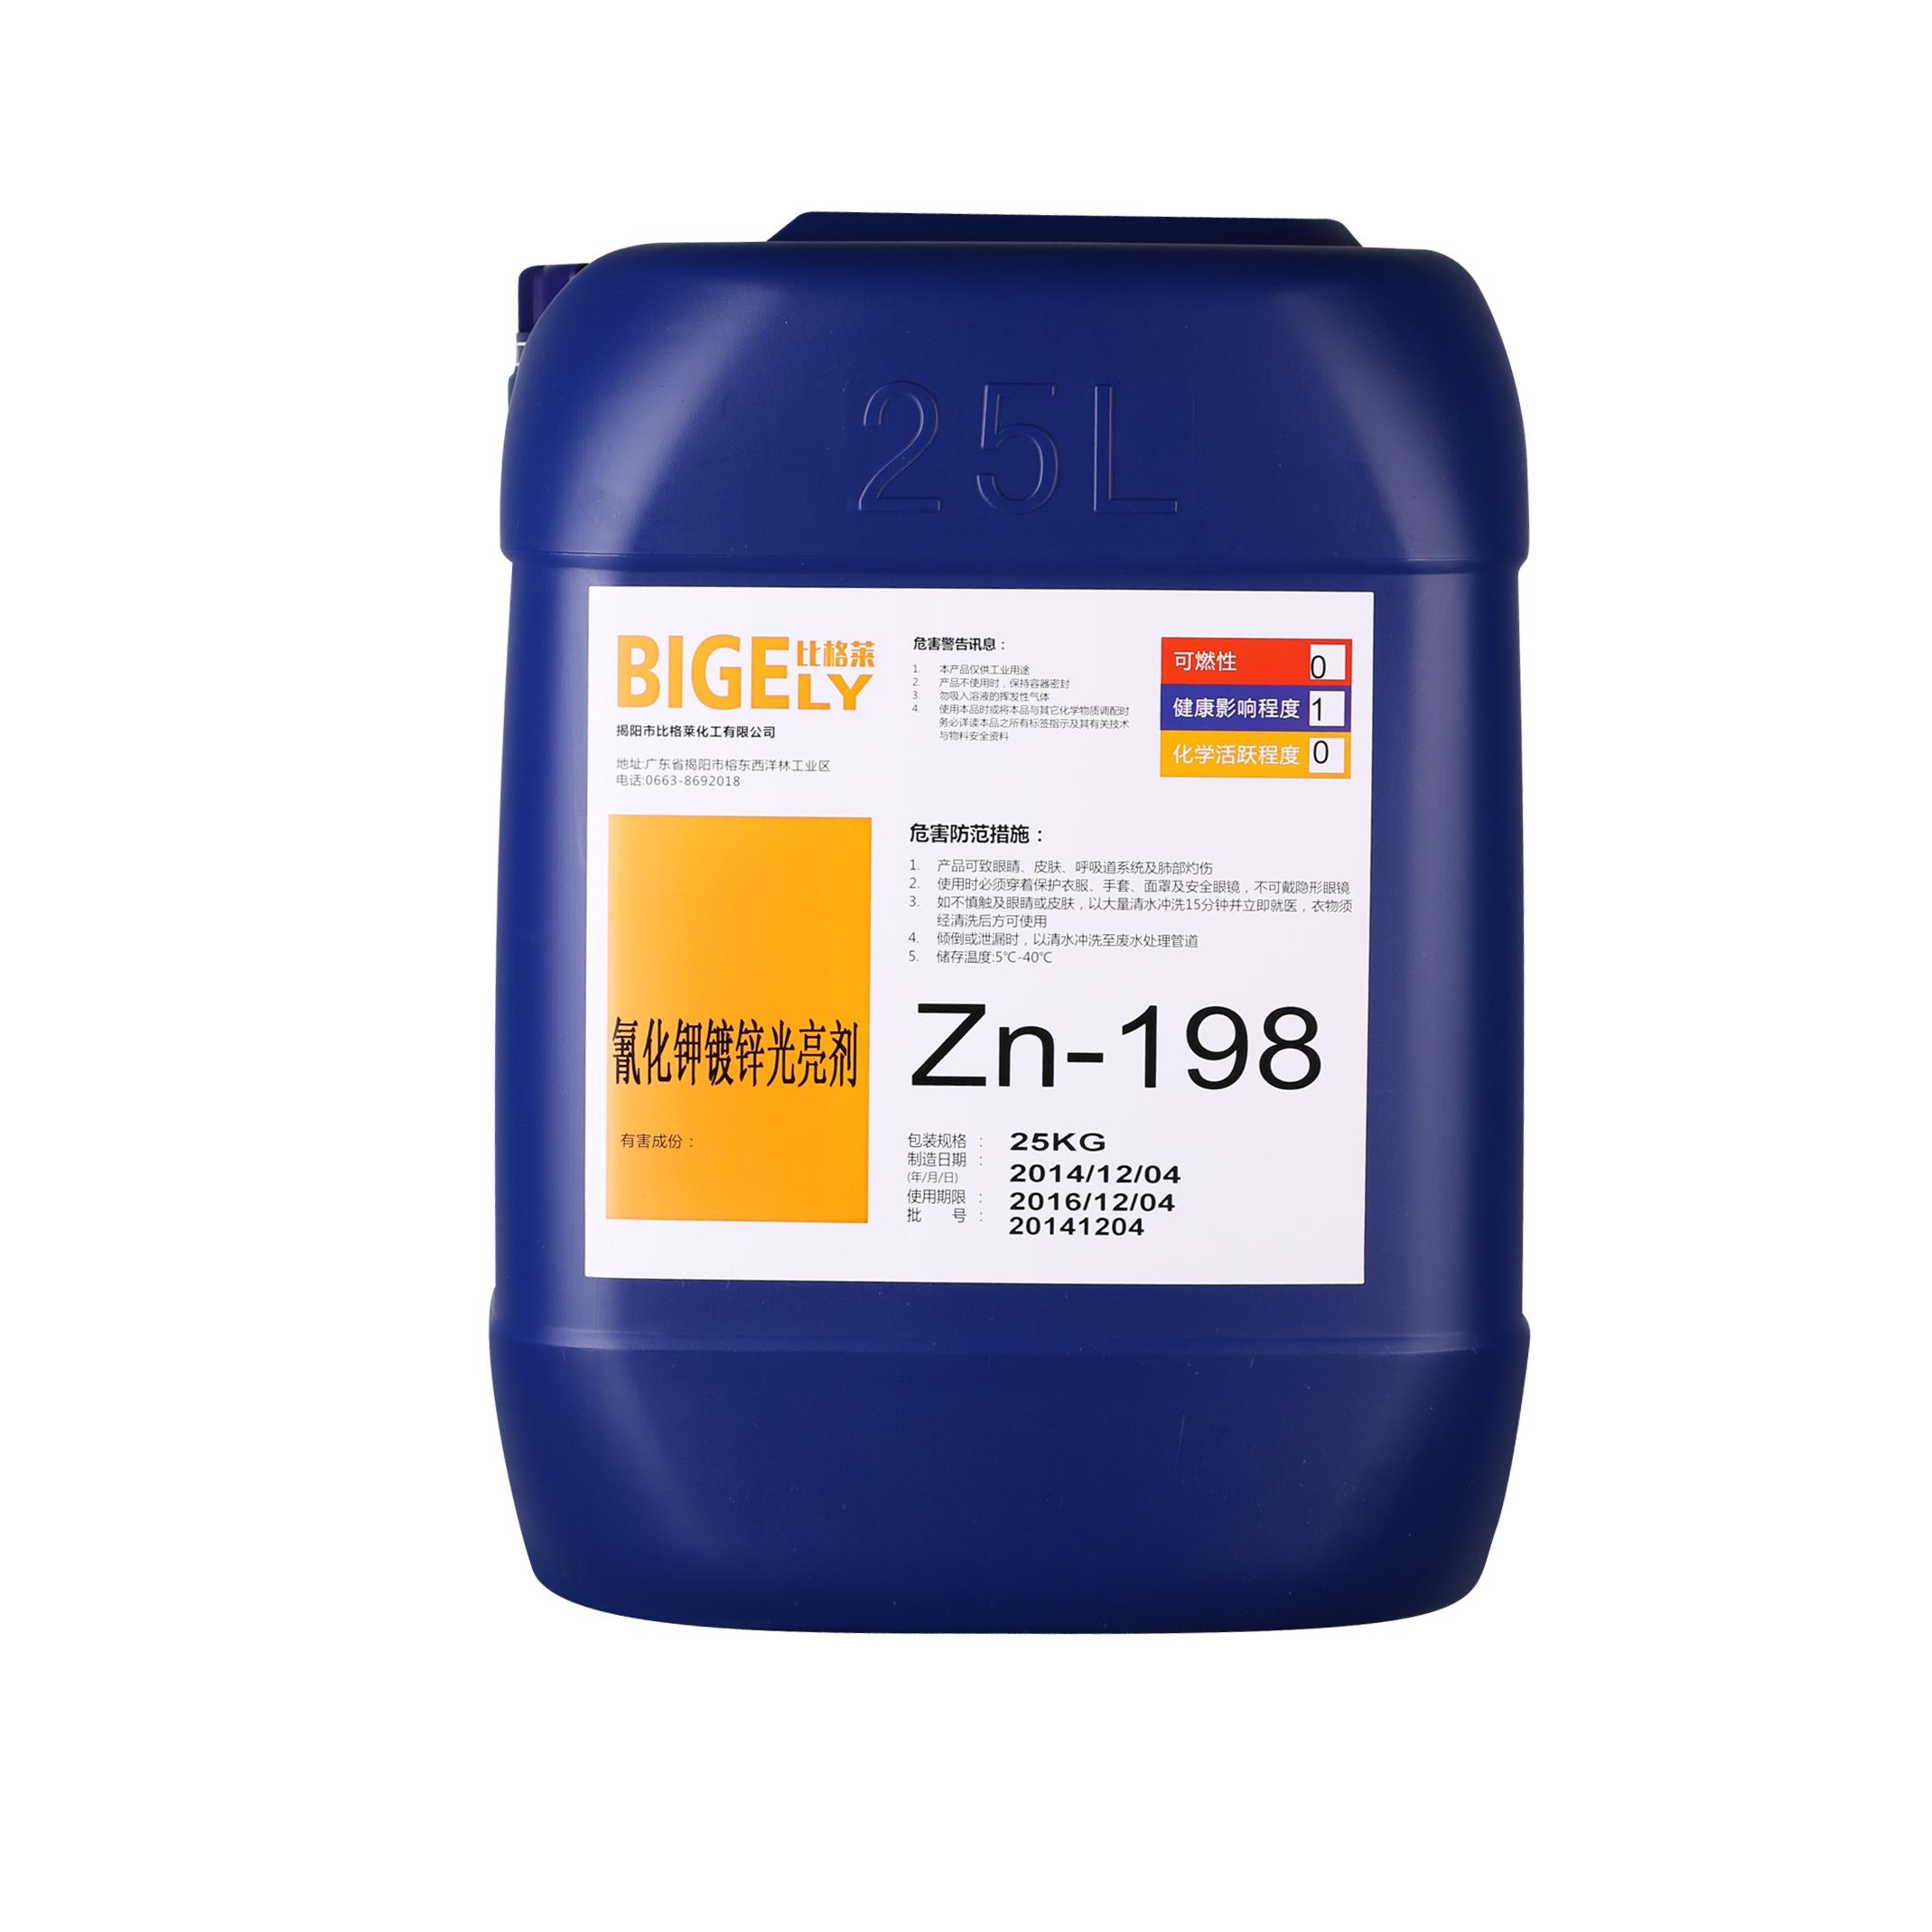 Zn-198